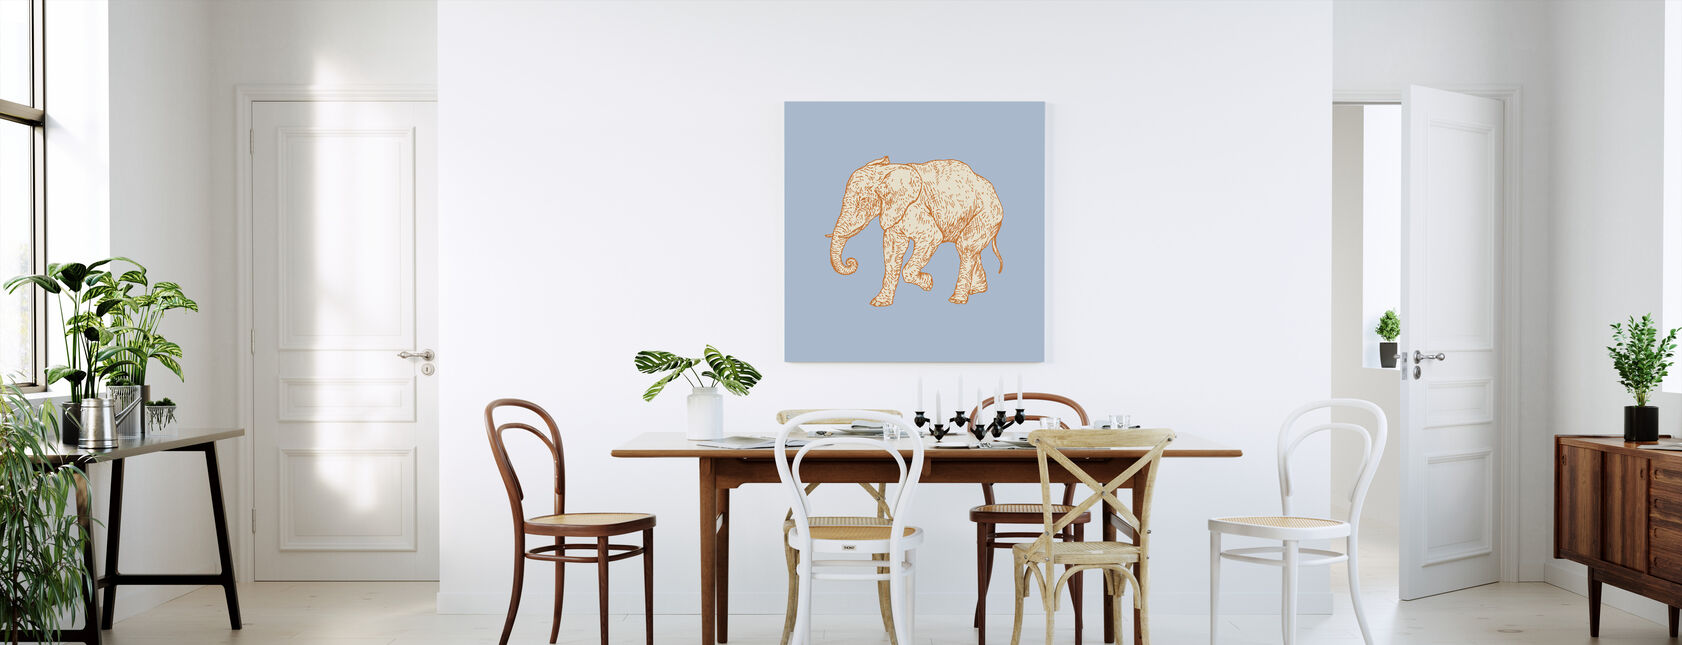 Elephant Cookie - Canvas print - Kitchen